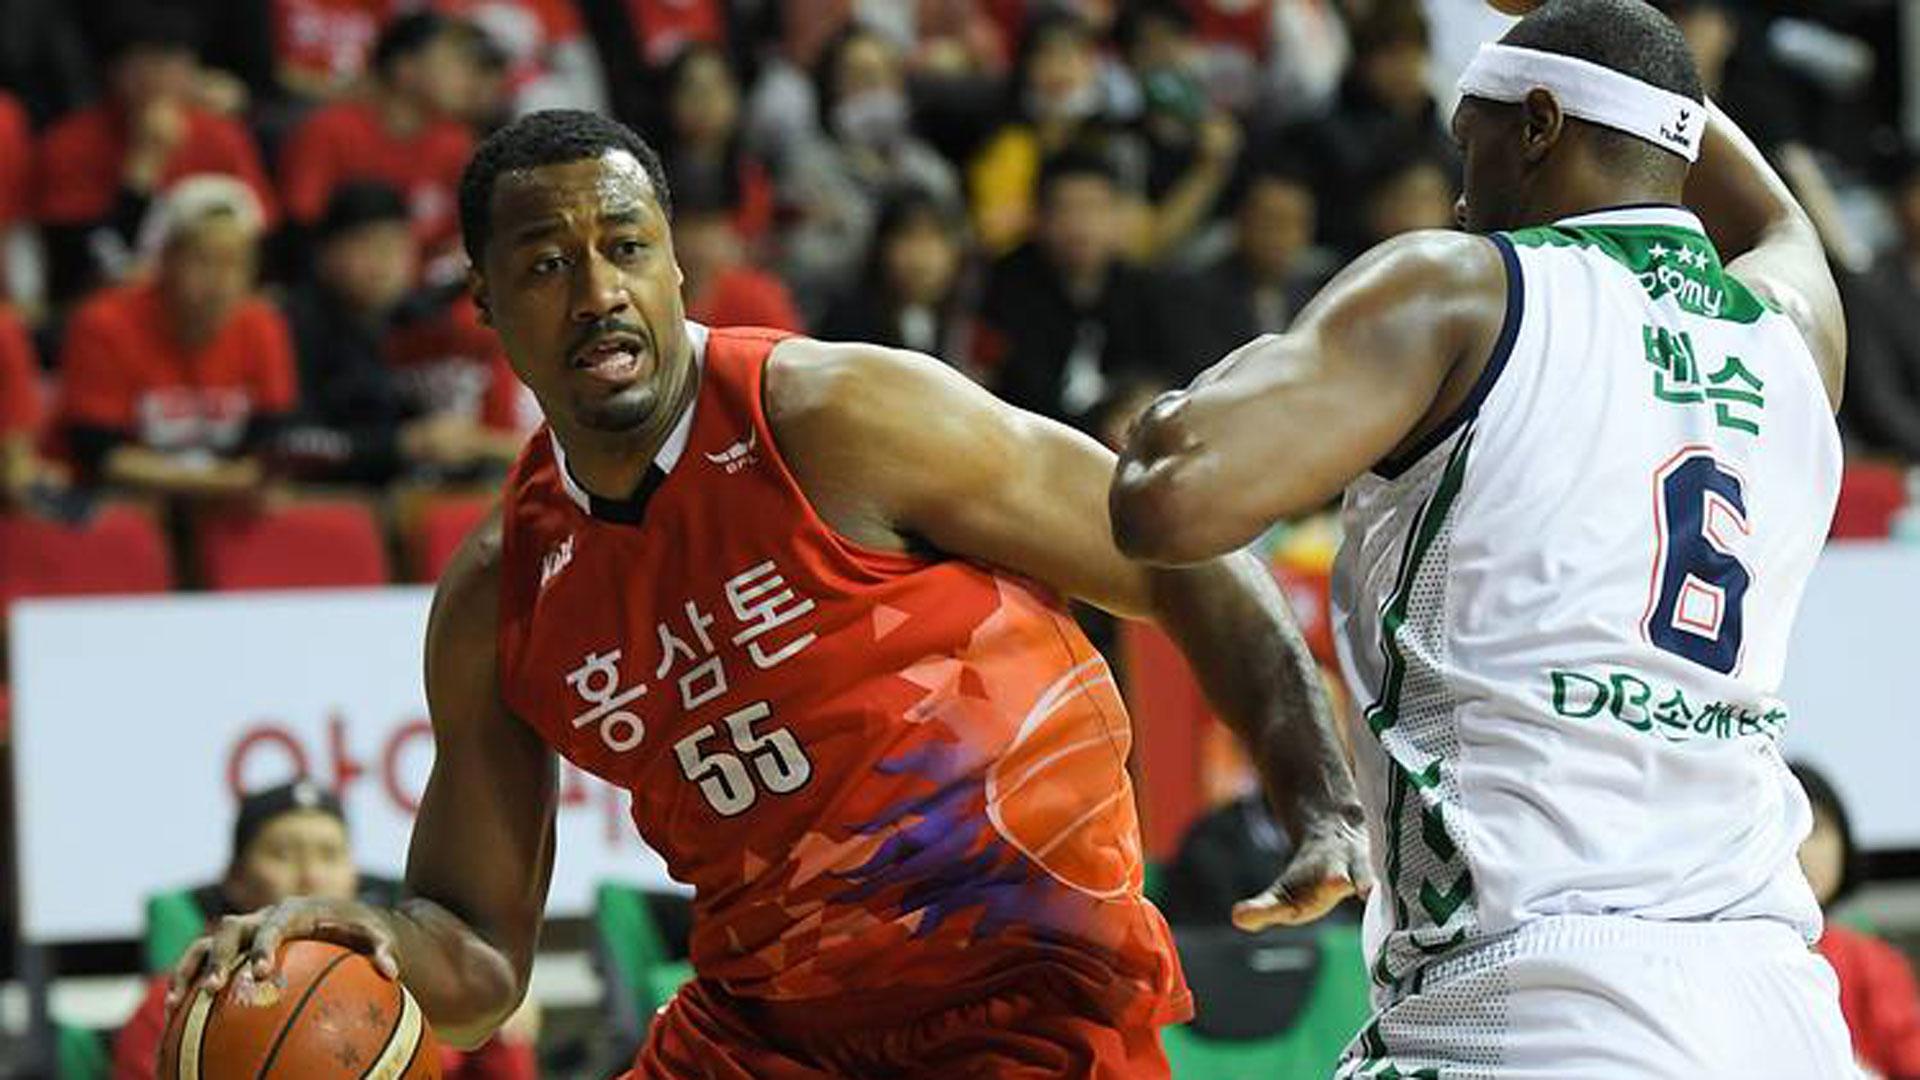 Korean basketball league KBL